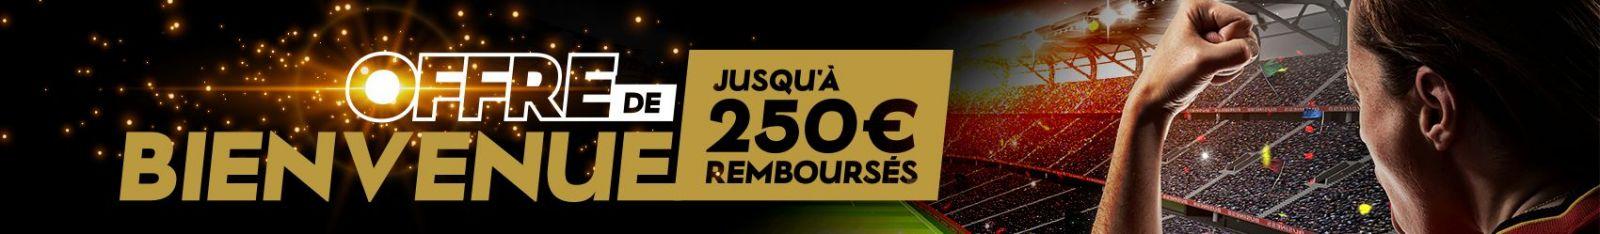 Bonus Barriere Bet 250€ avis et test bookmaker